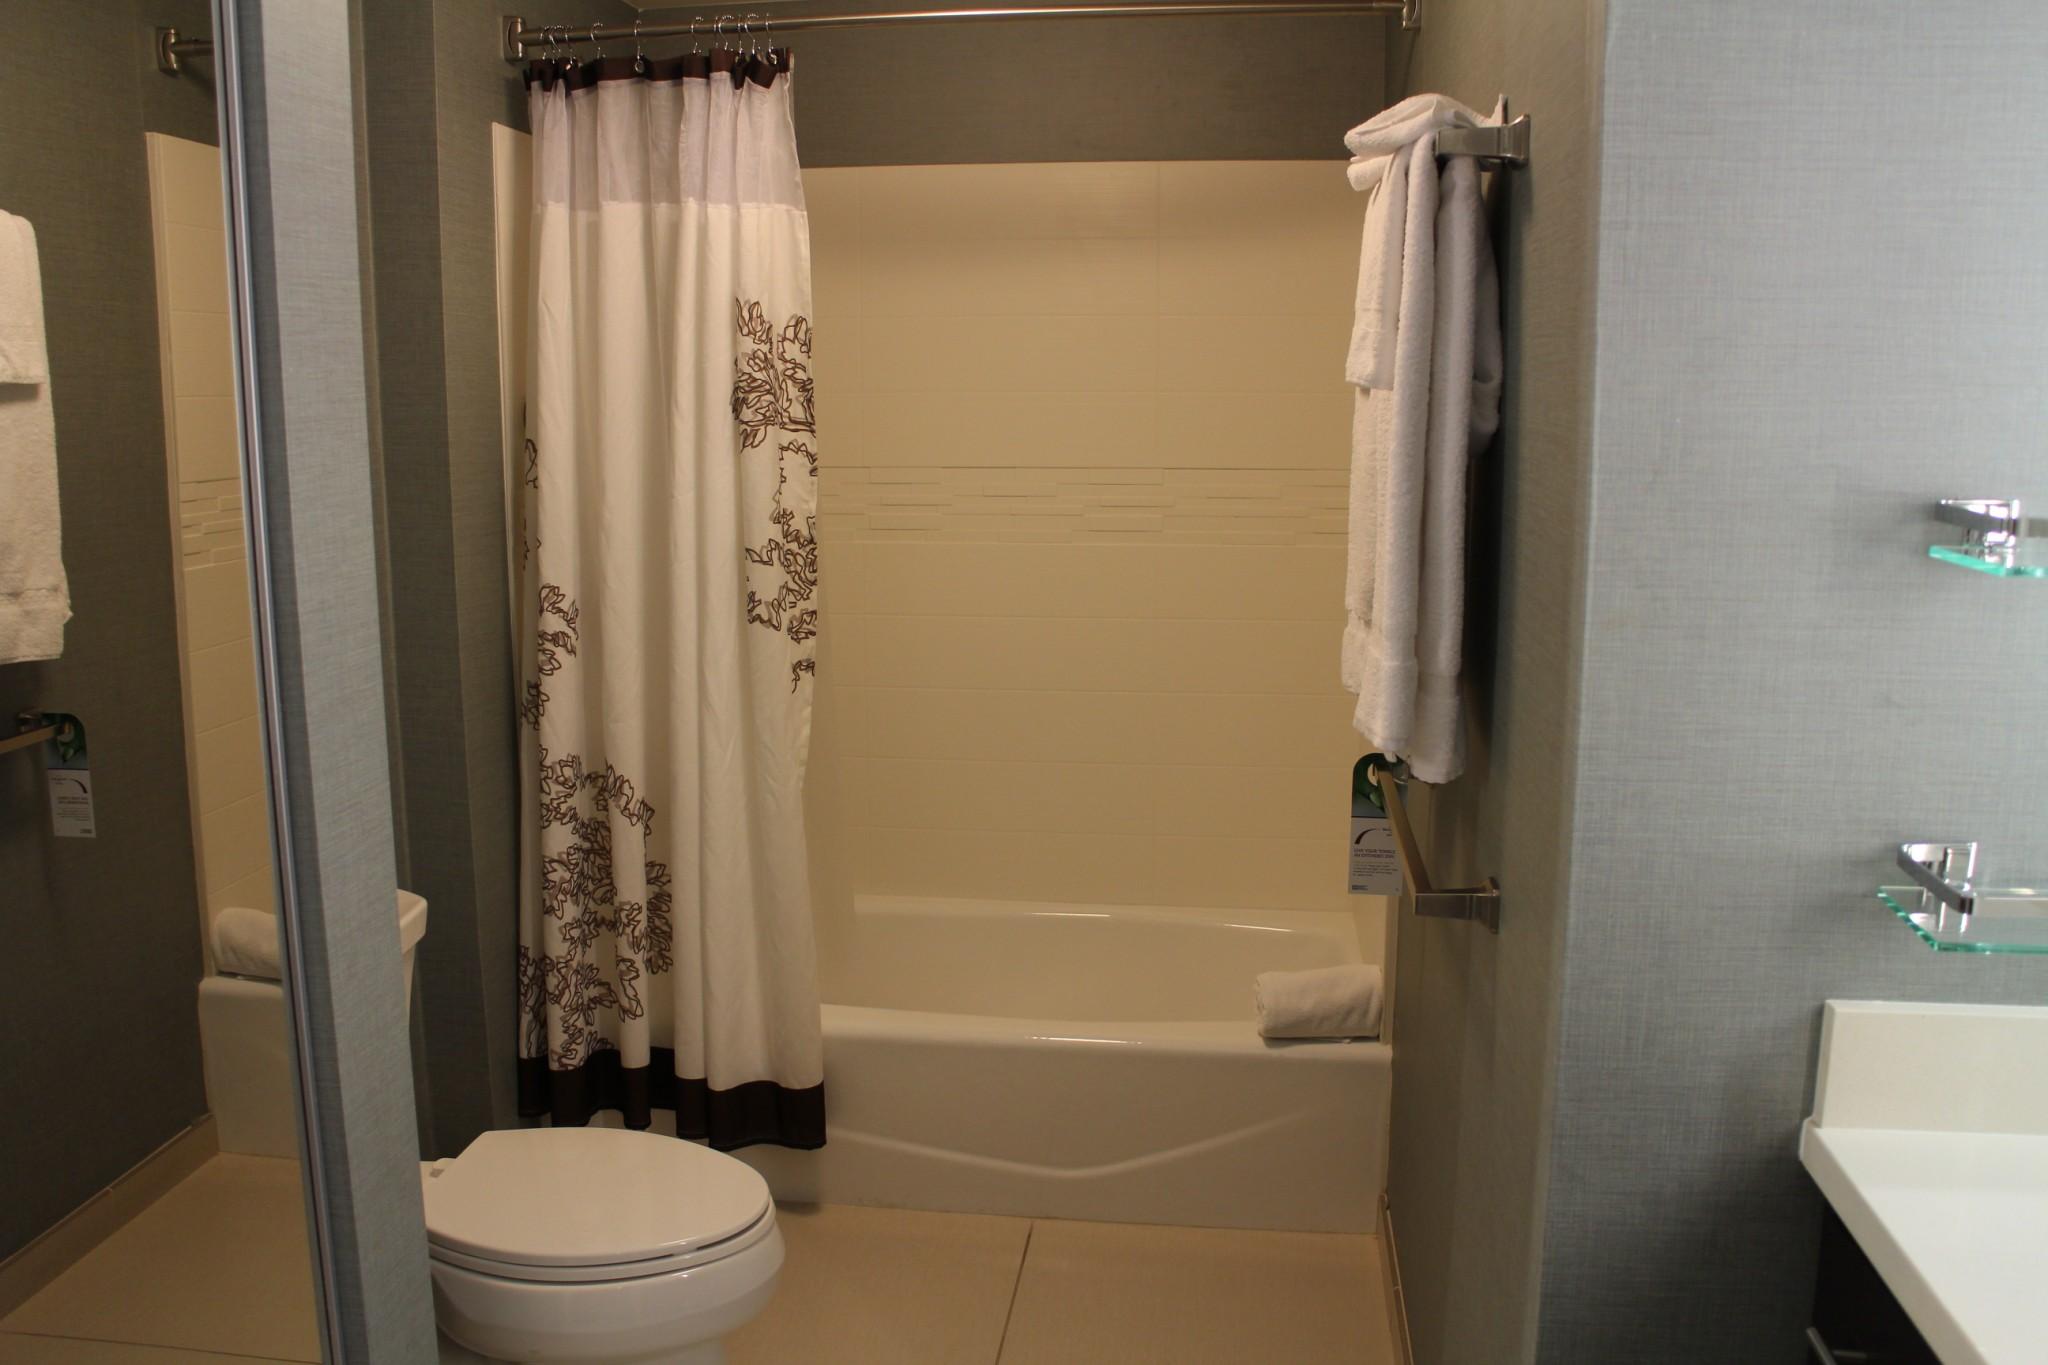 Residence Inn Redondo Beach Los Angeles bathroom